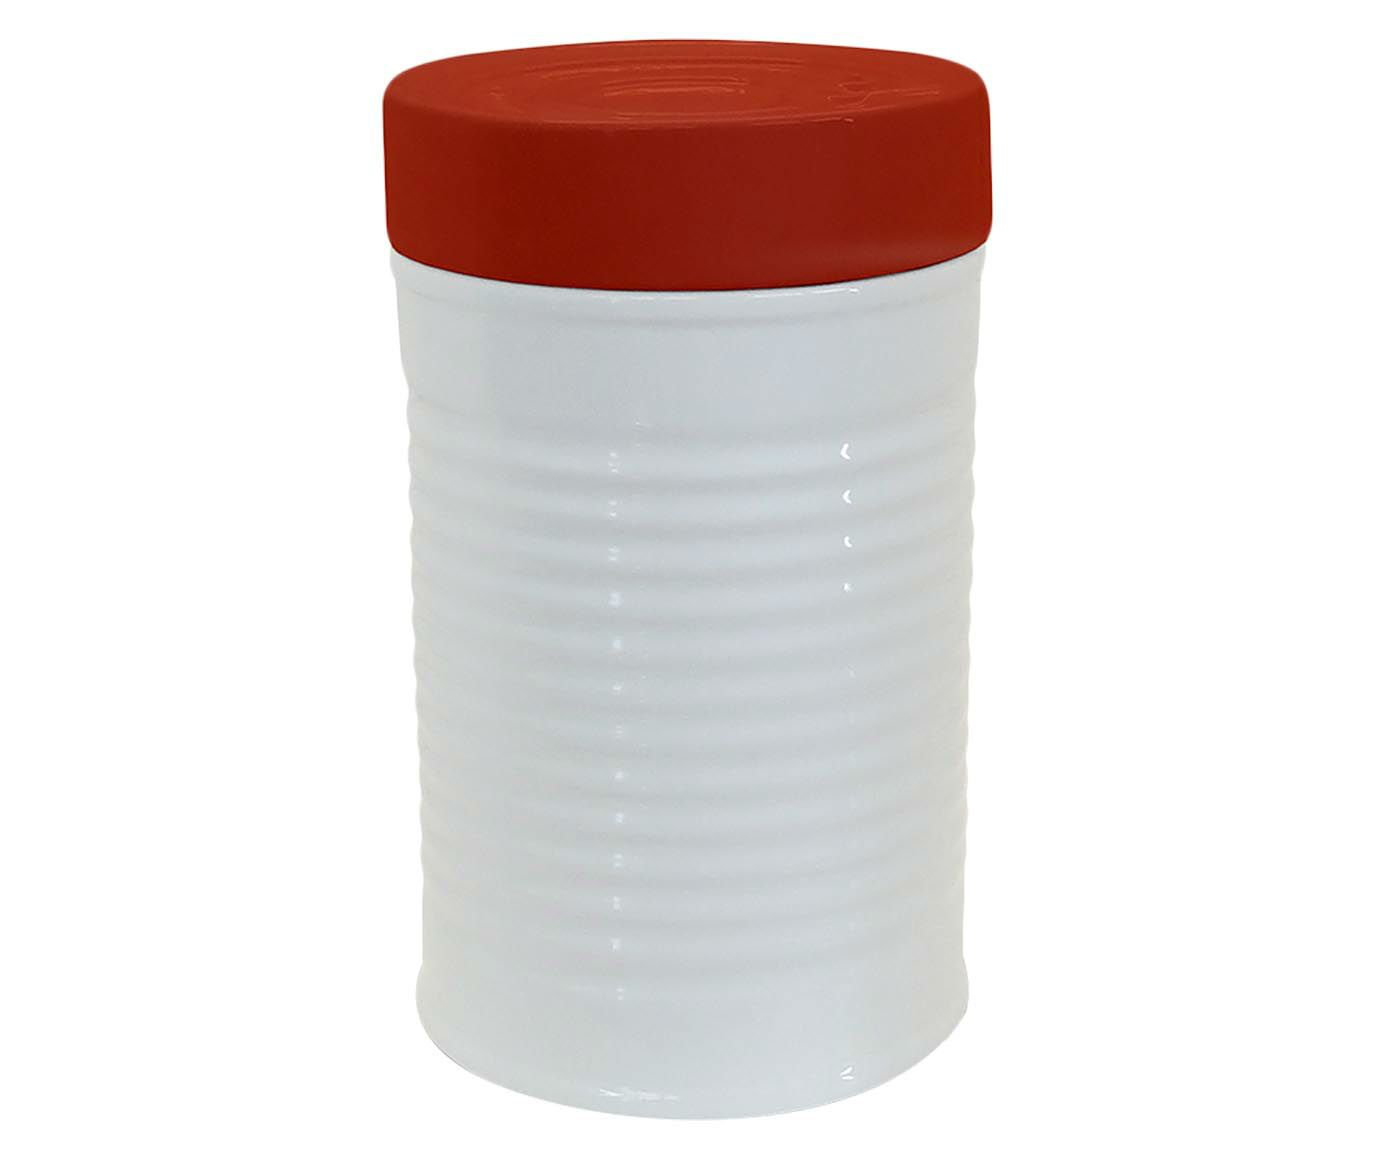 Pote espalier rouge - 1300 ml | Westwing.com.br